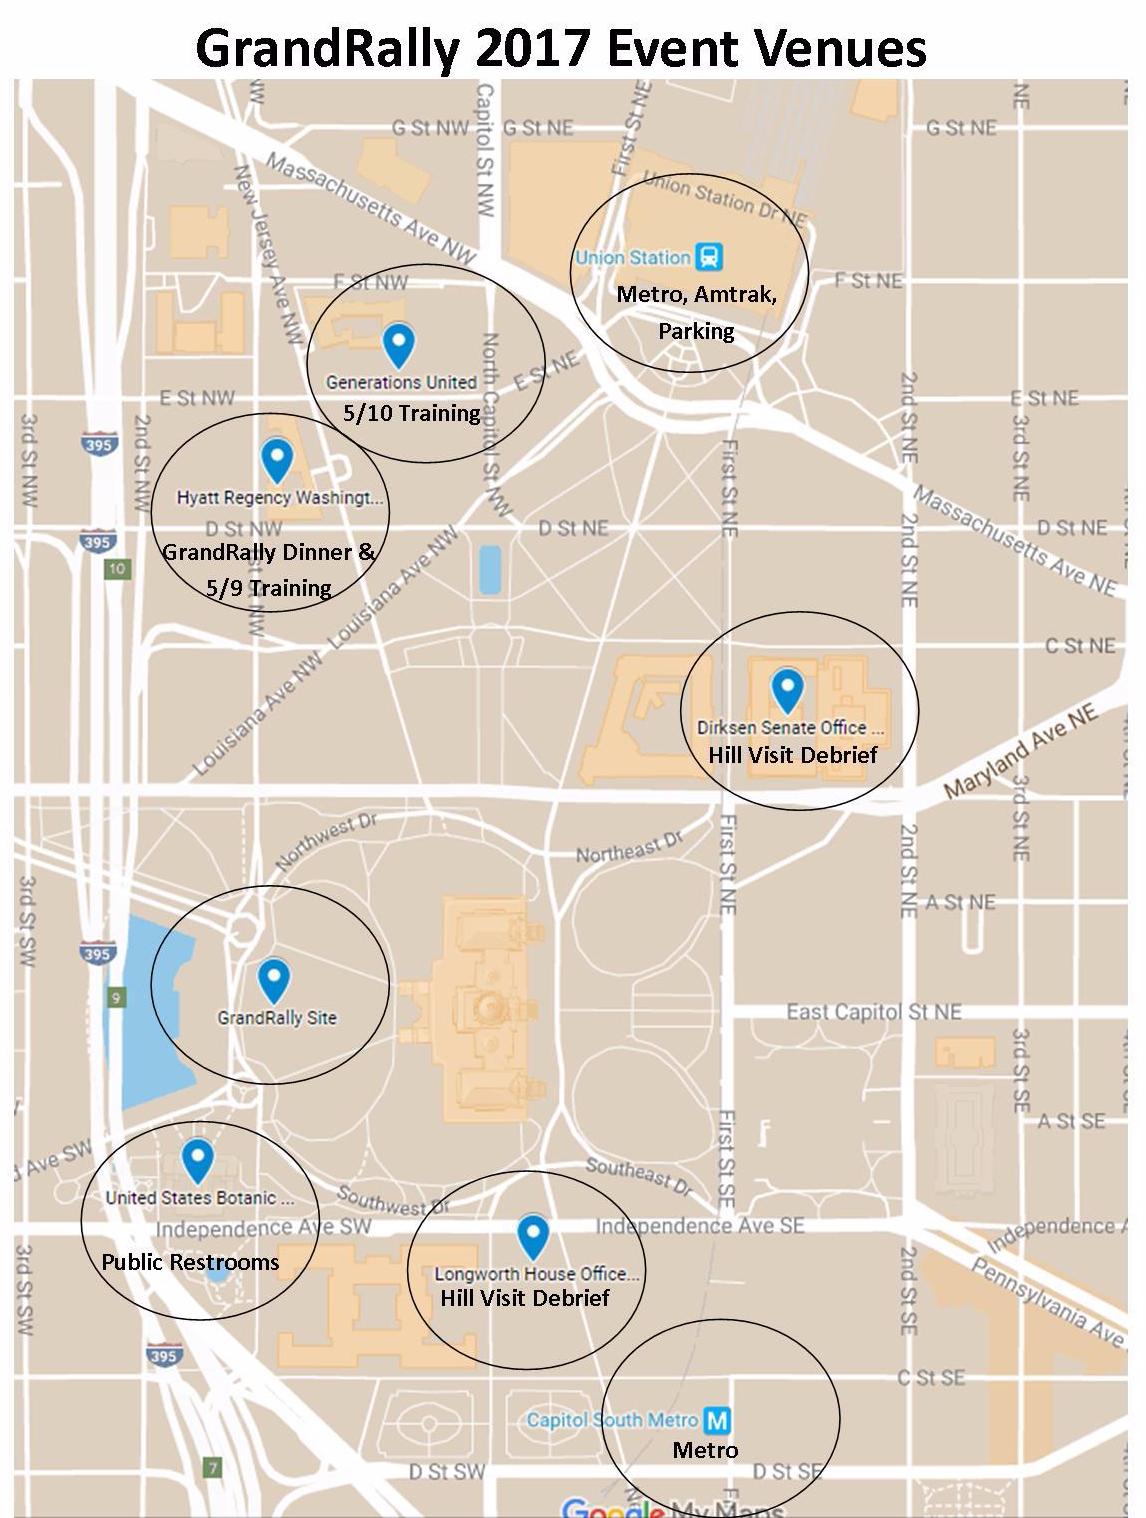 venue-map.jpg